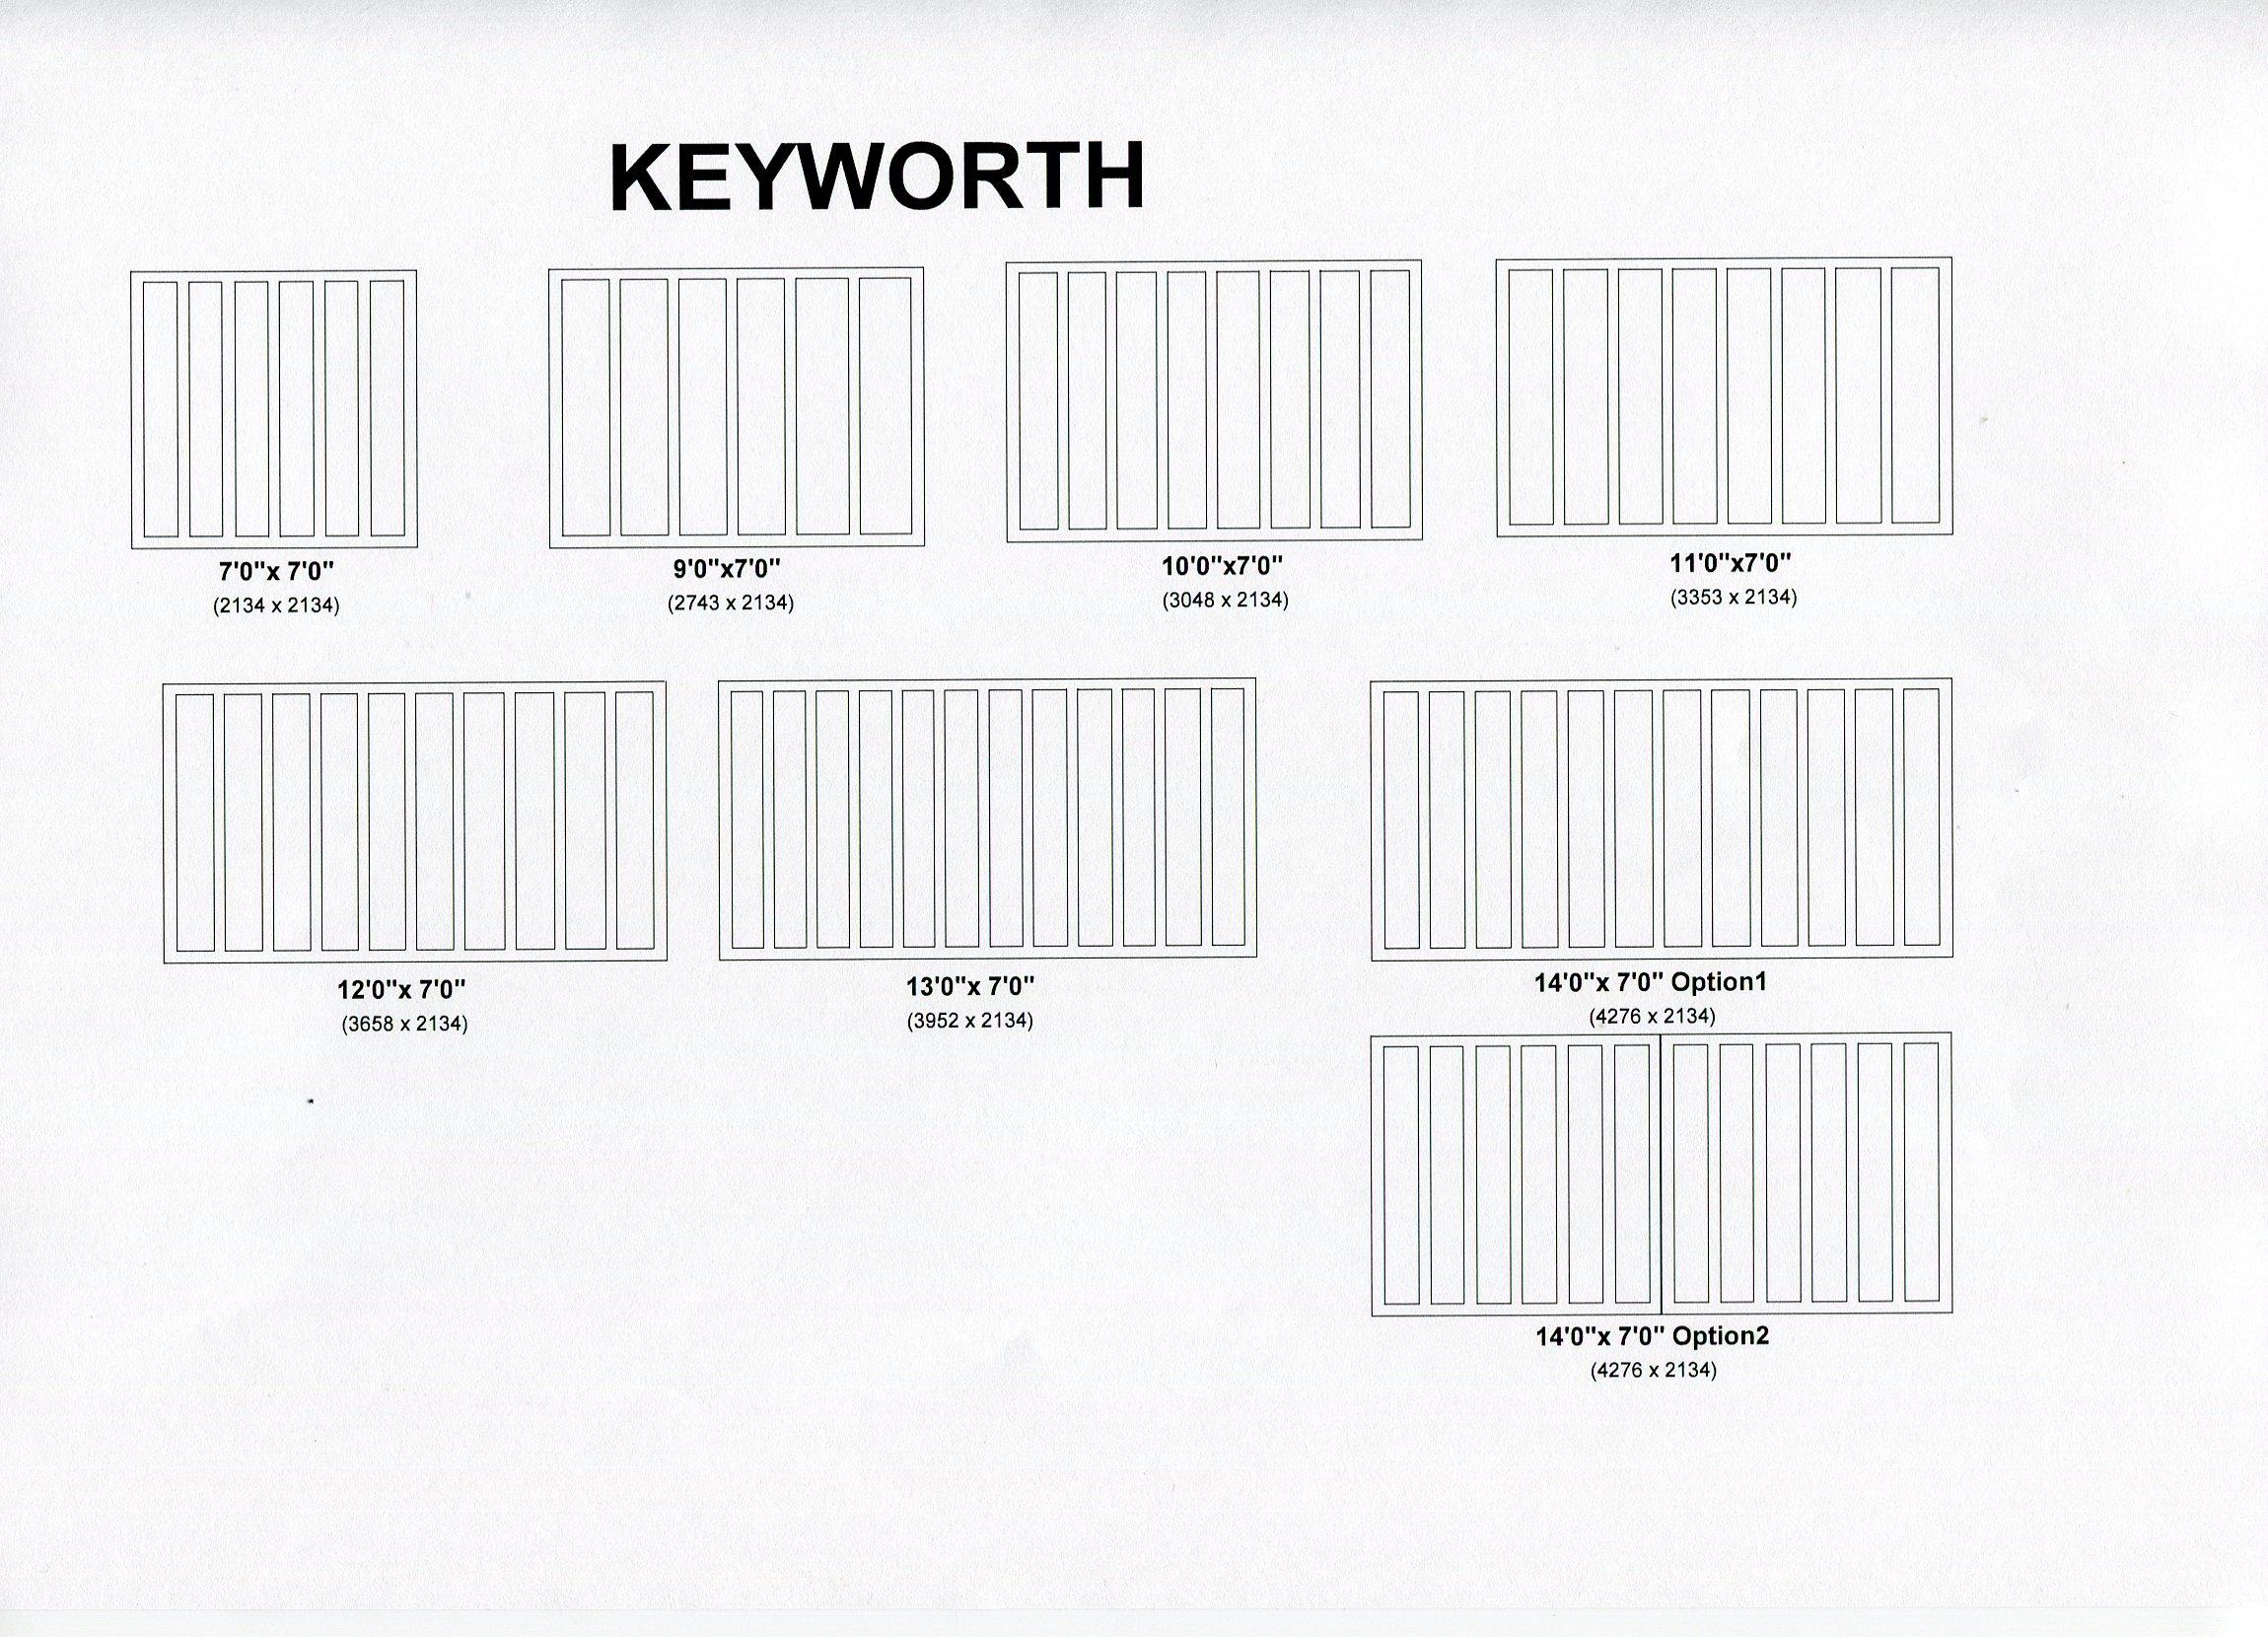 Cedar Door Keyworth design options